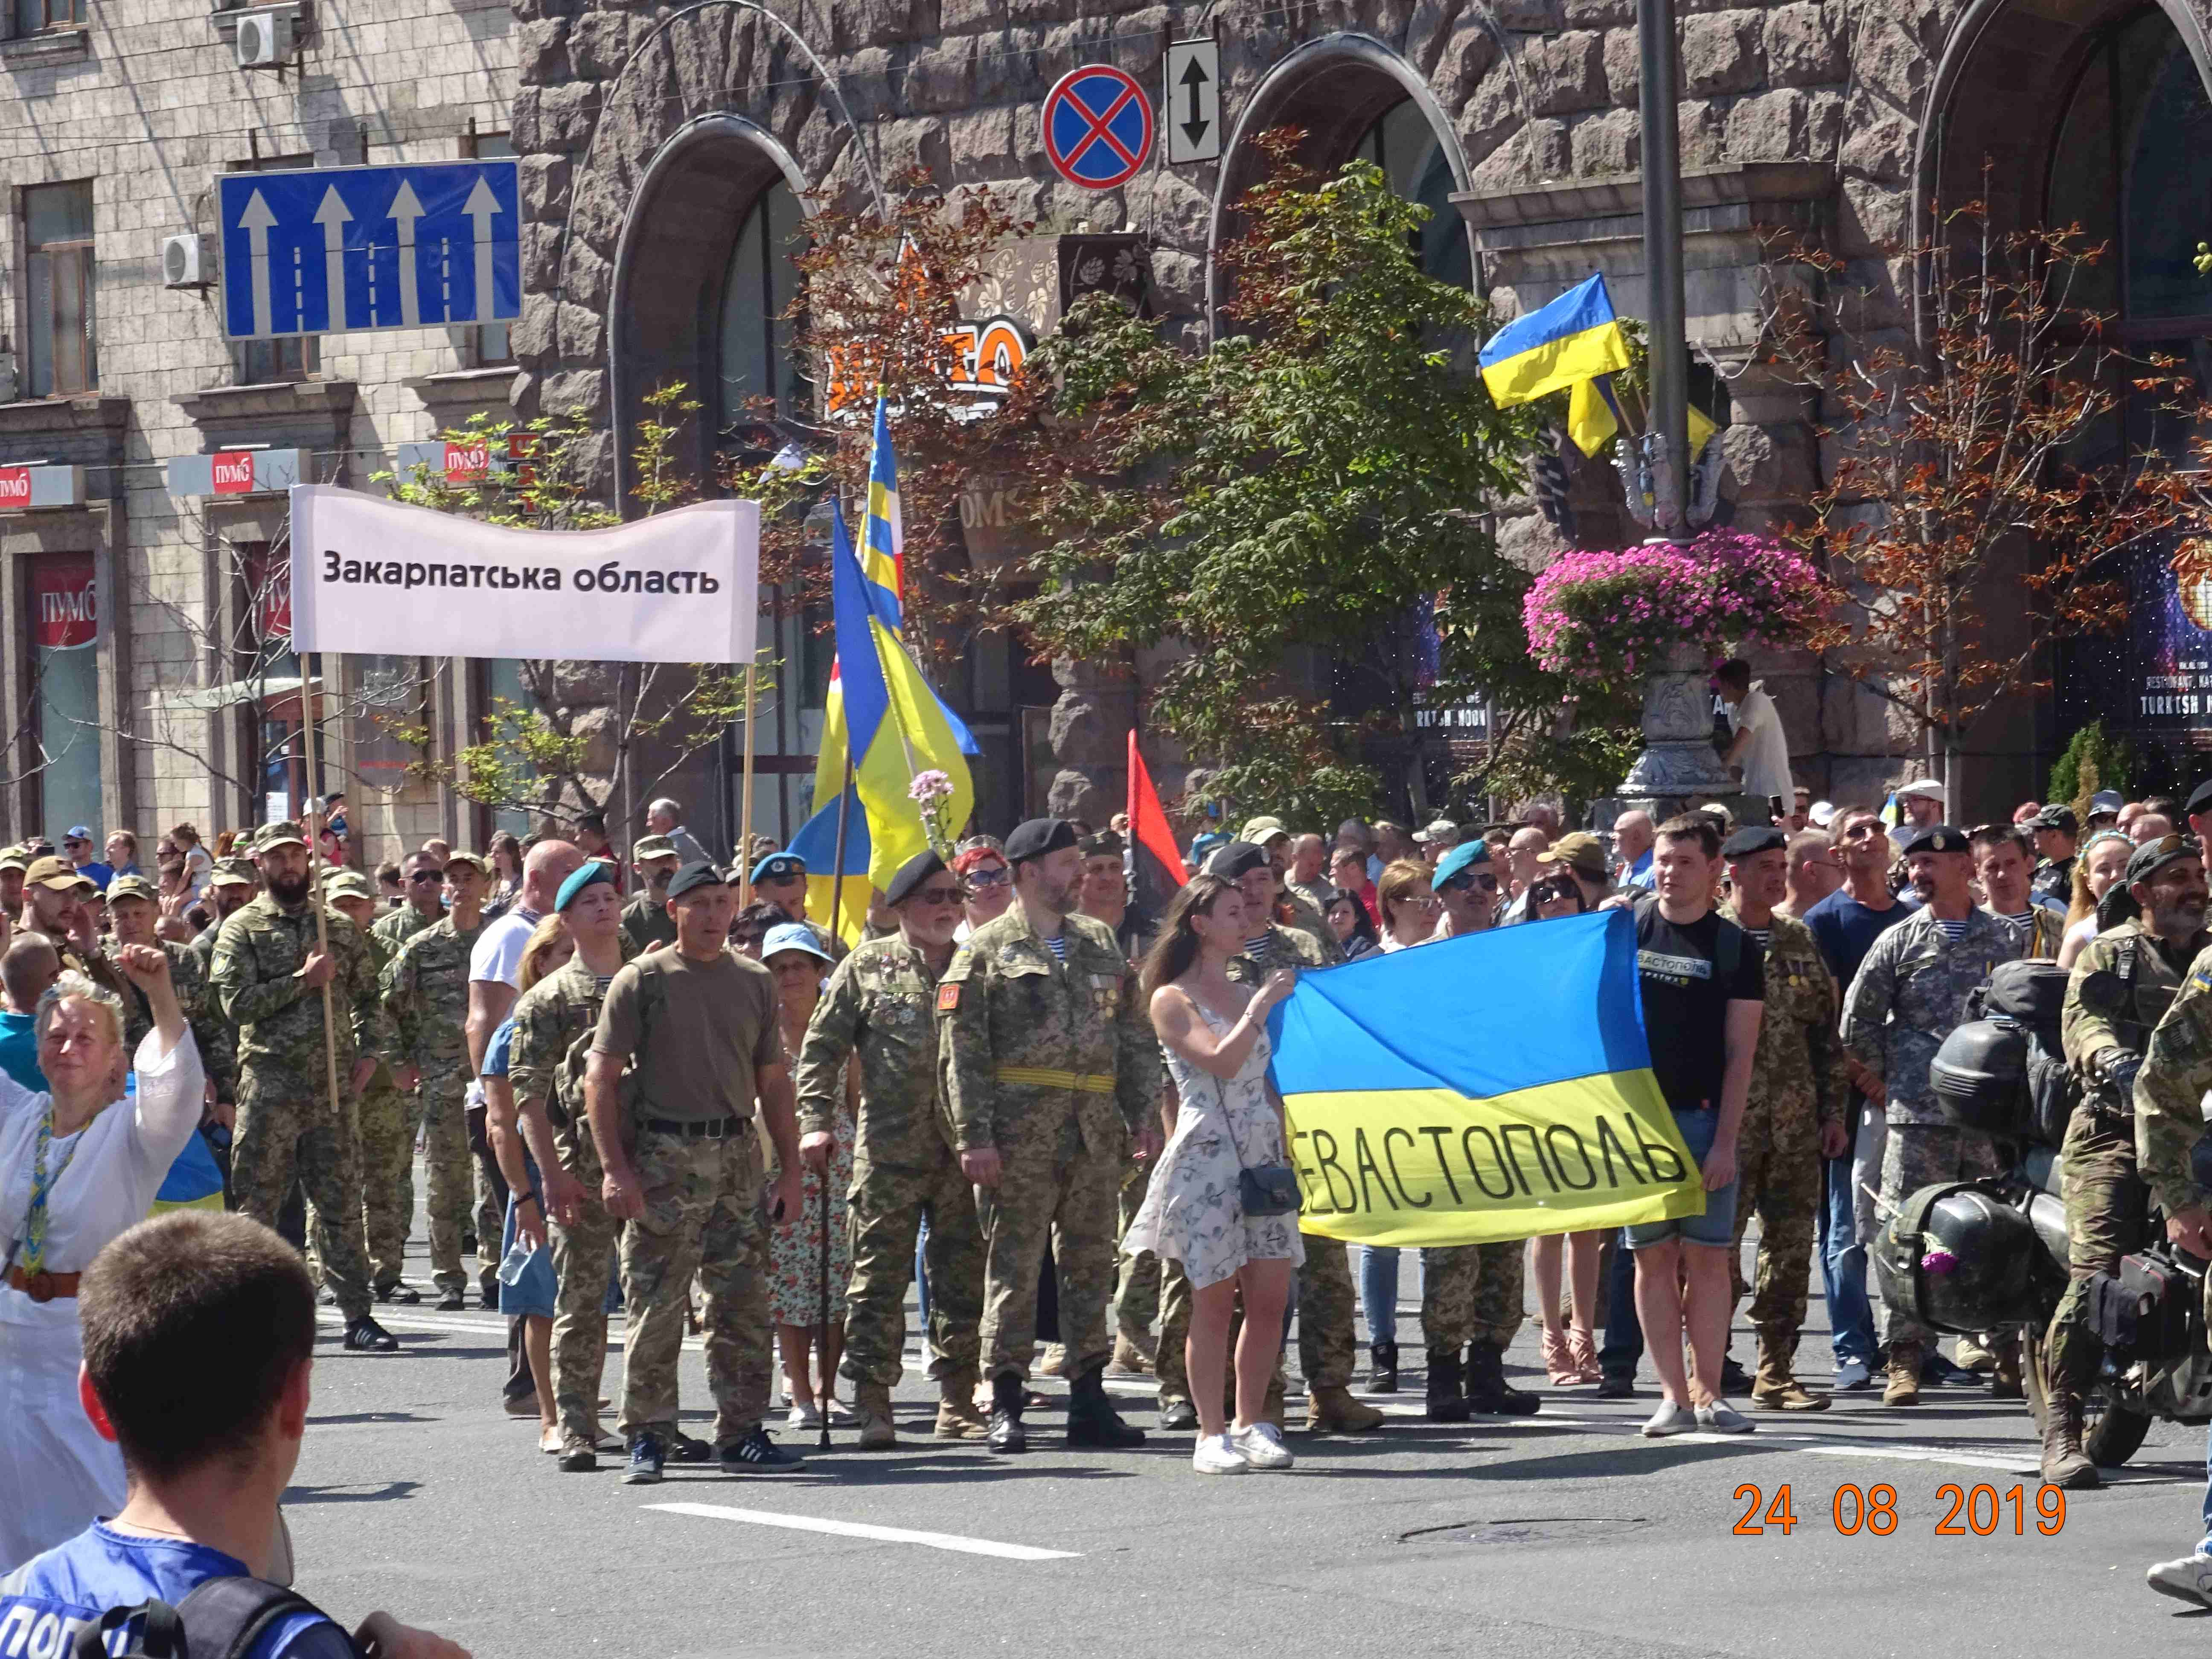 Defenders-of-Ukraine-Parad-24.Aug.19 - DSC06247.jpg